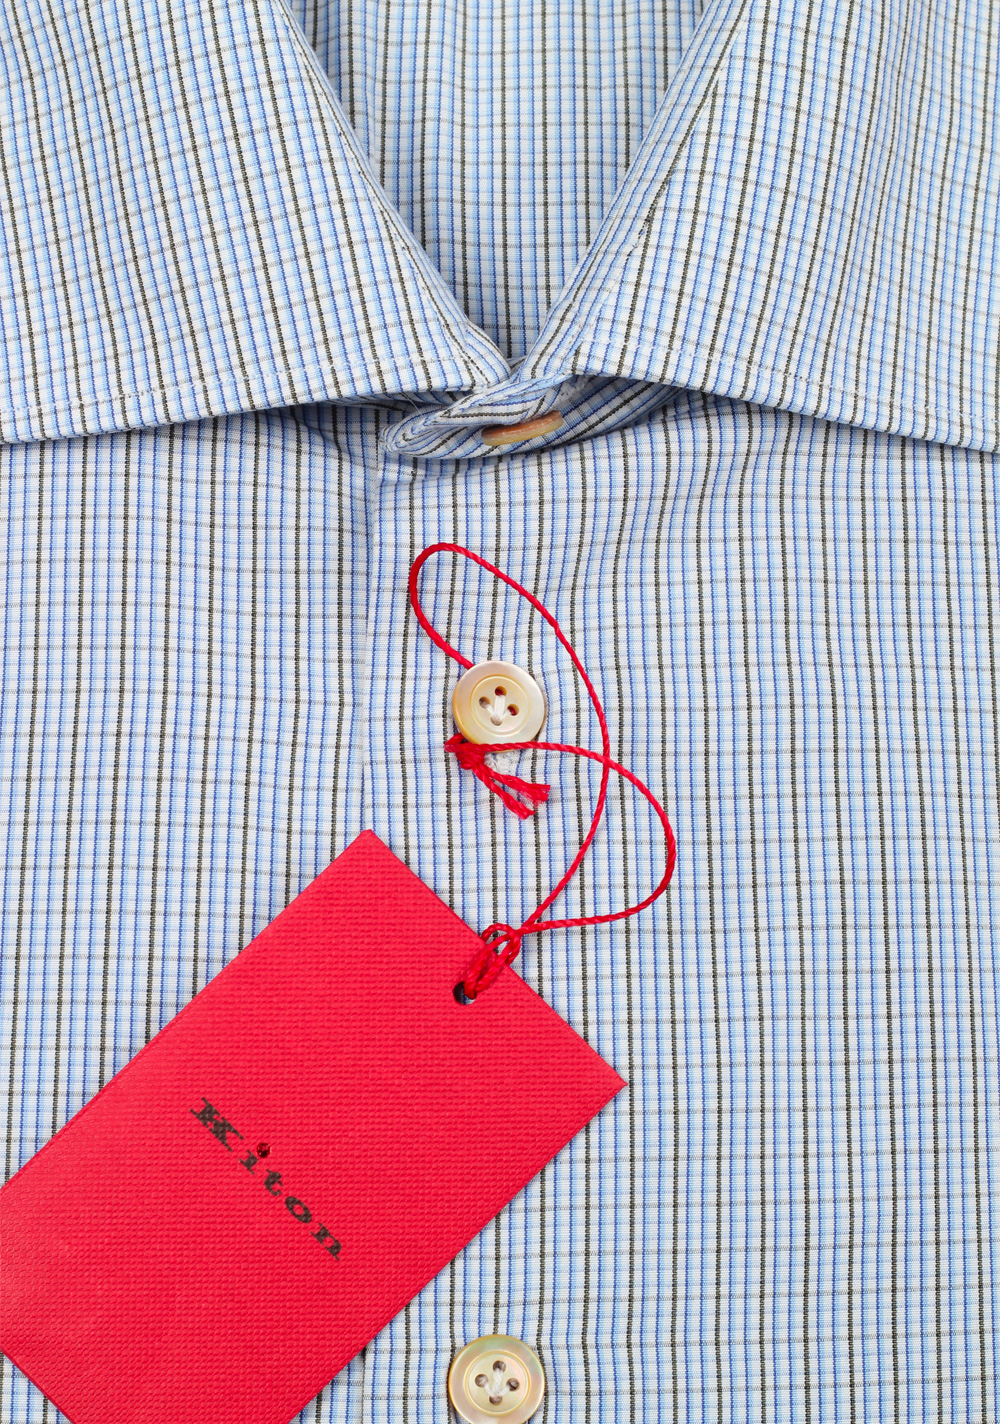 Kiton Checked White Blue Gray Shirt Size 45 / 18 U.S. | Costume Limité